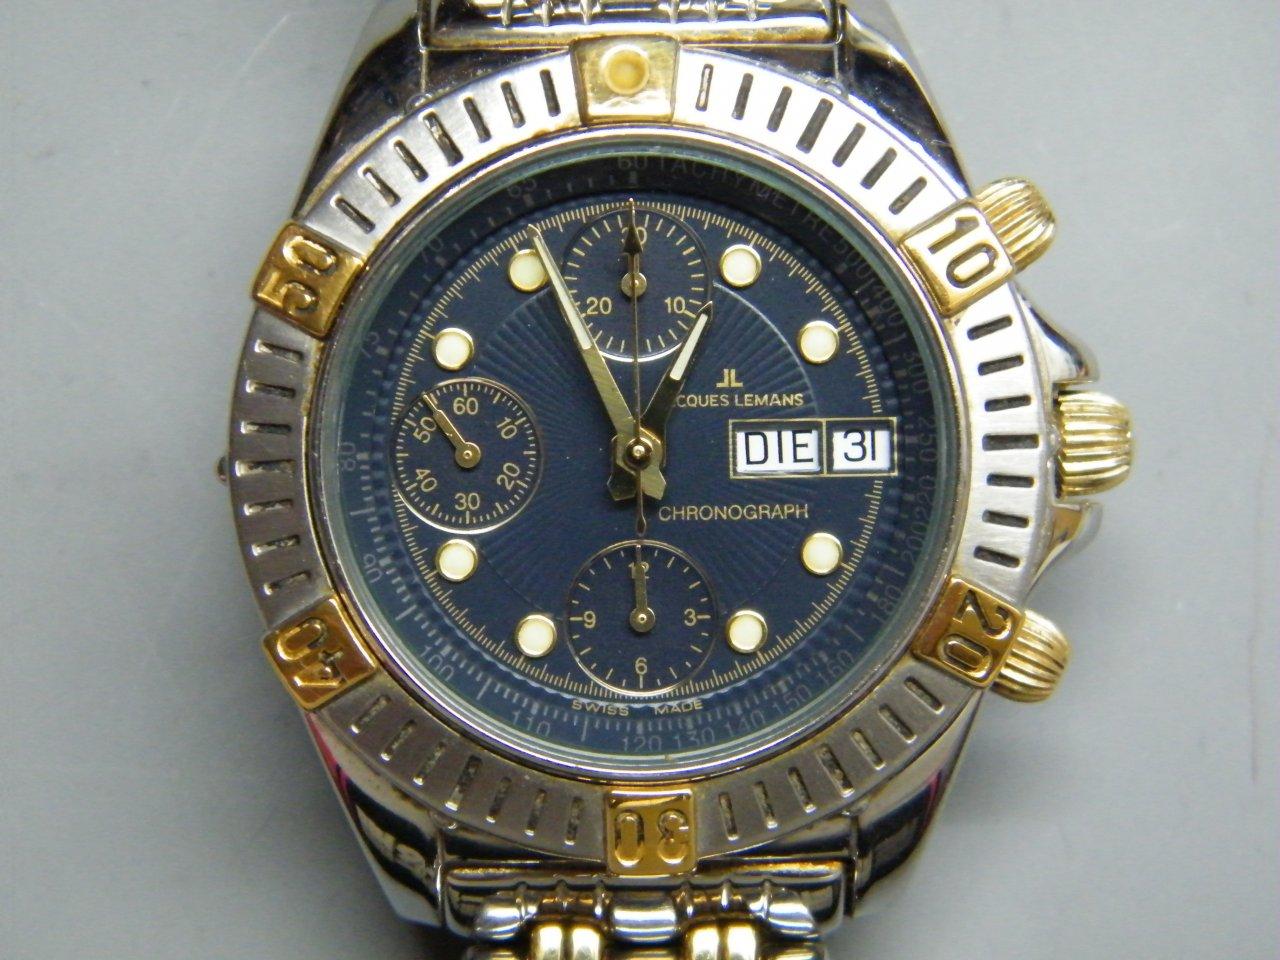 verkauf jacques lemans chronograph stahl gold valjoux 7750 uhrforum. Black Bedroom Furniture Sets. Home Design Ideas